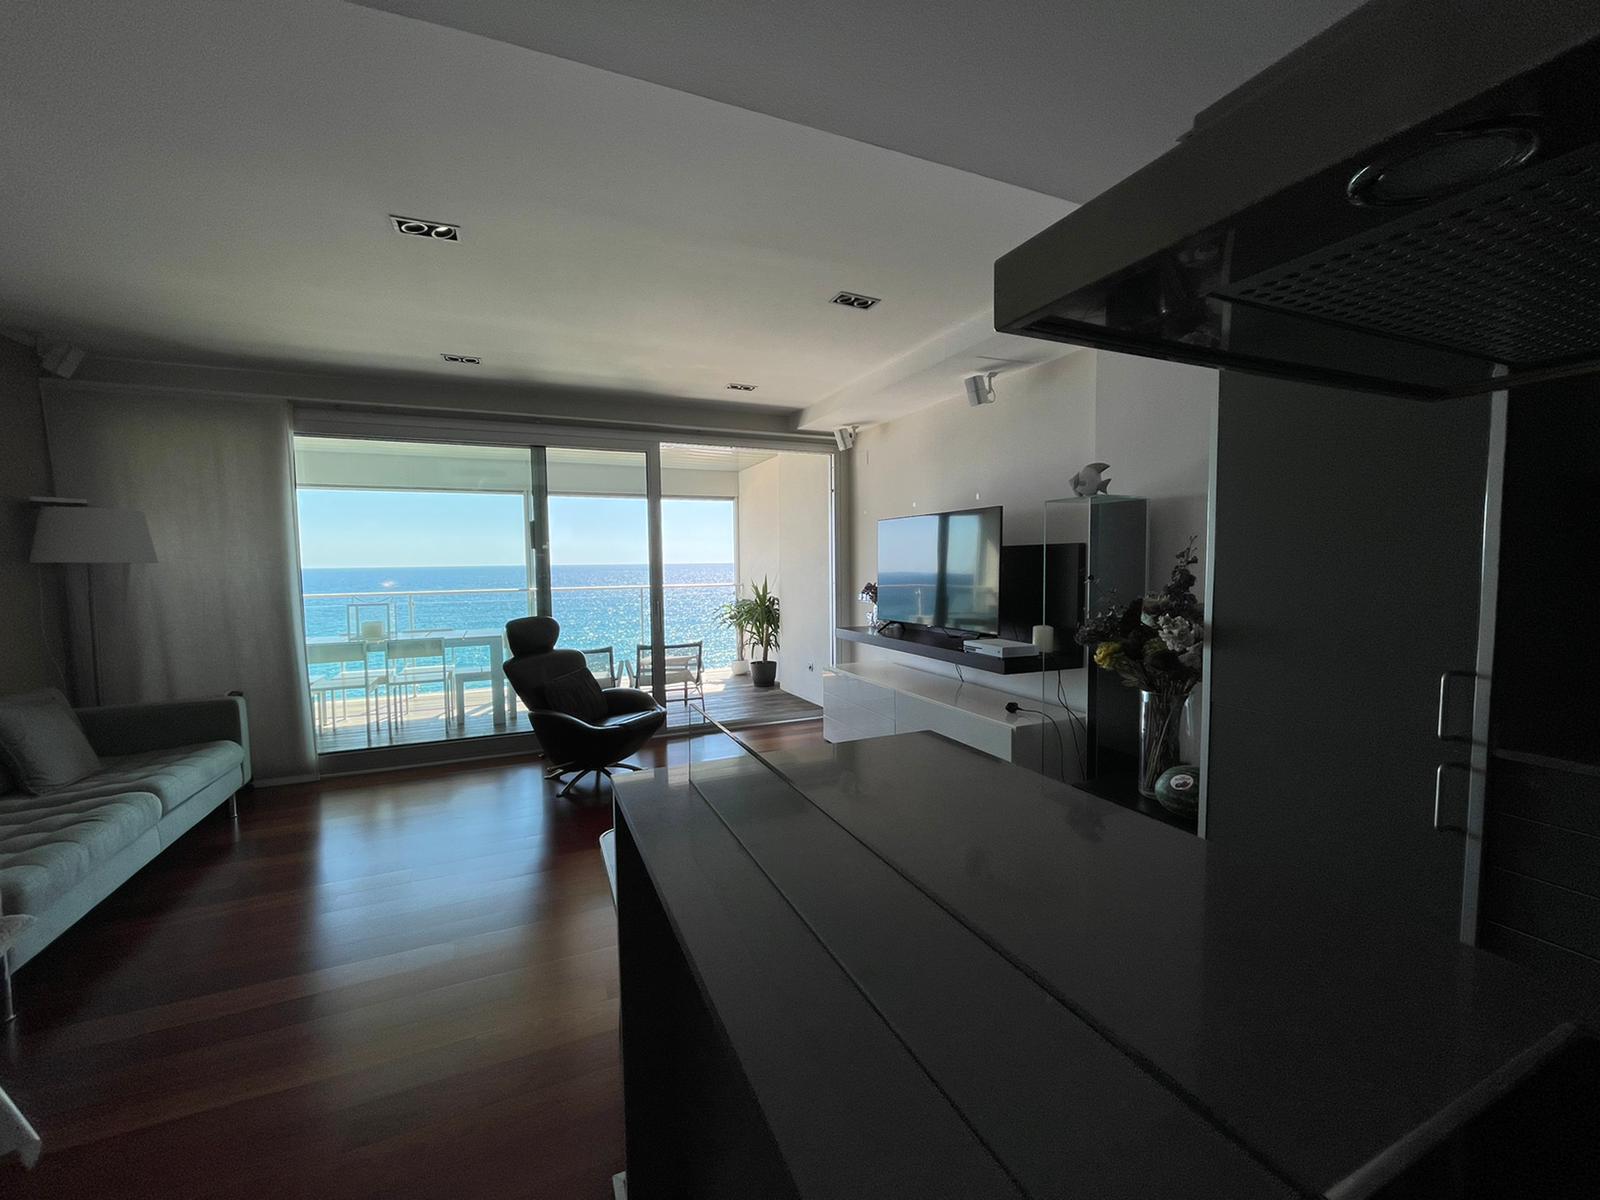 Фотогалерея Роскошная квартира на берегу моря